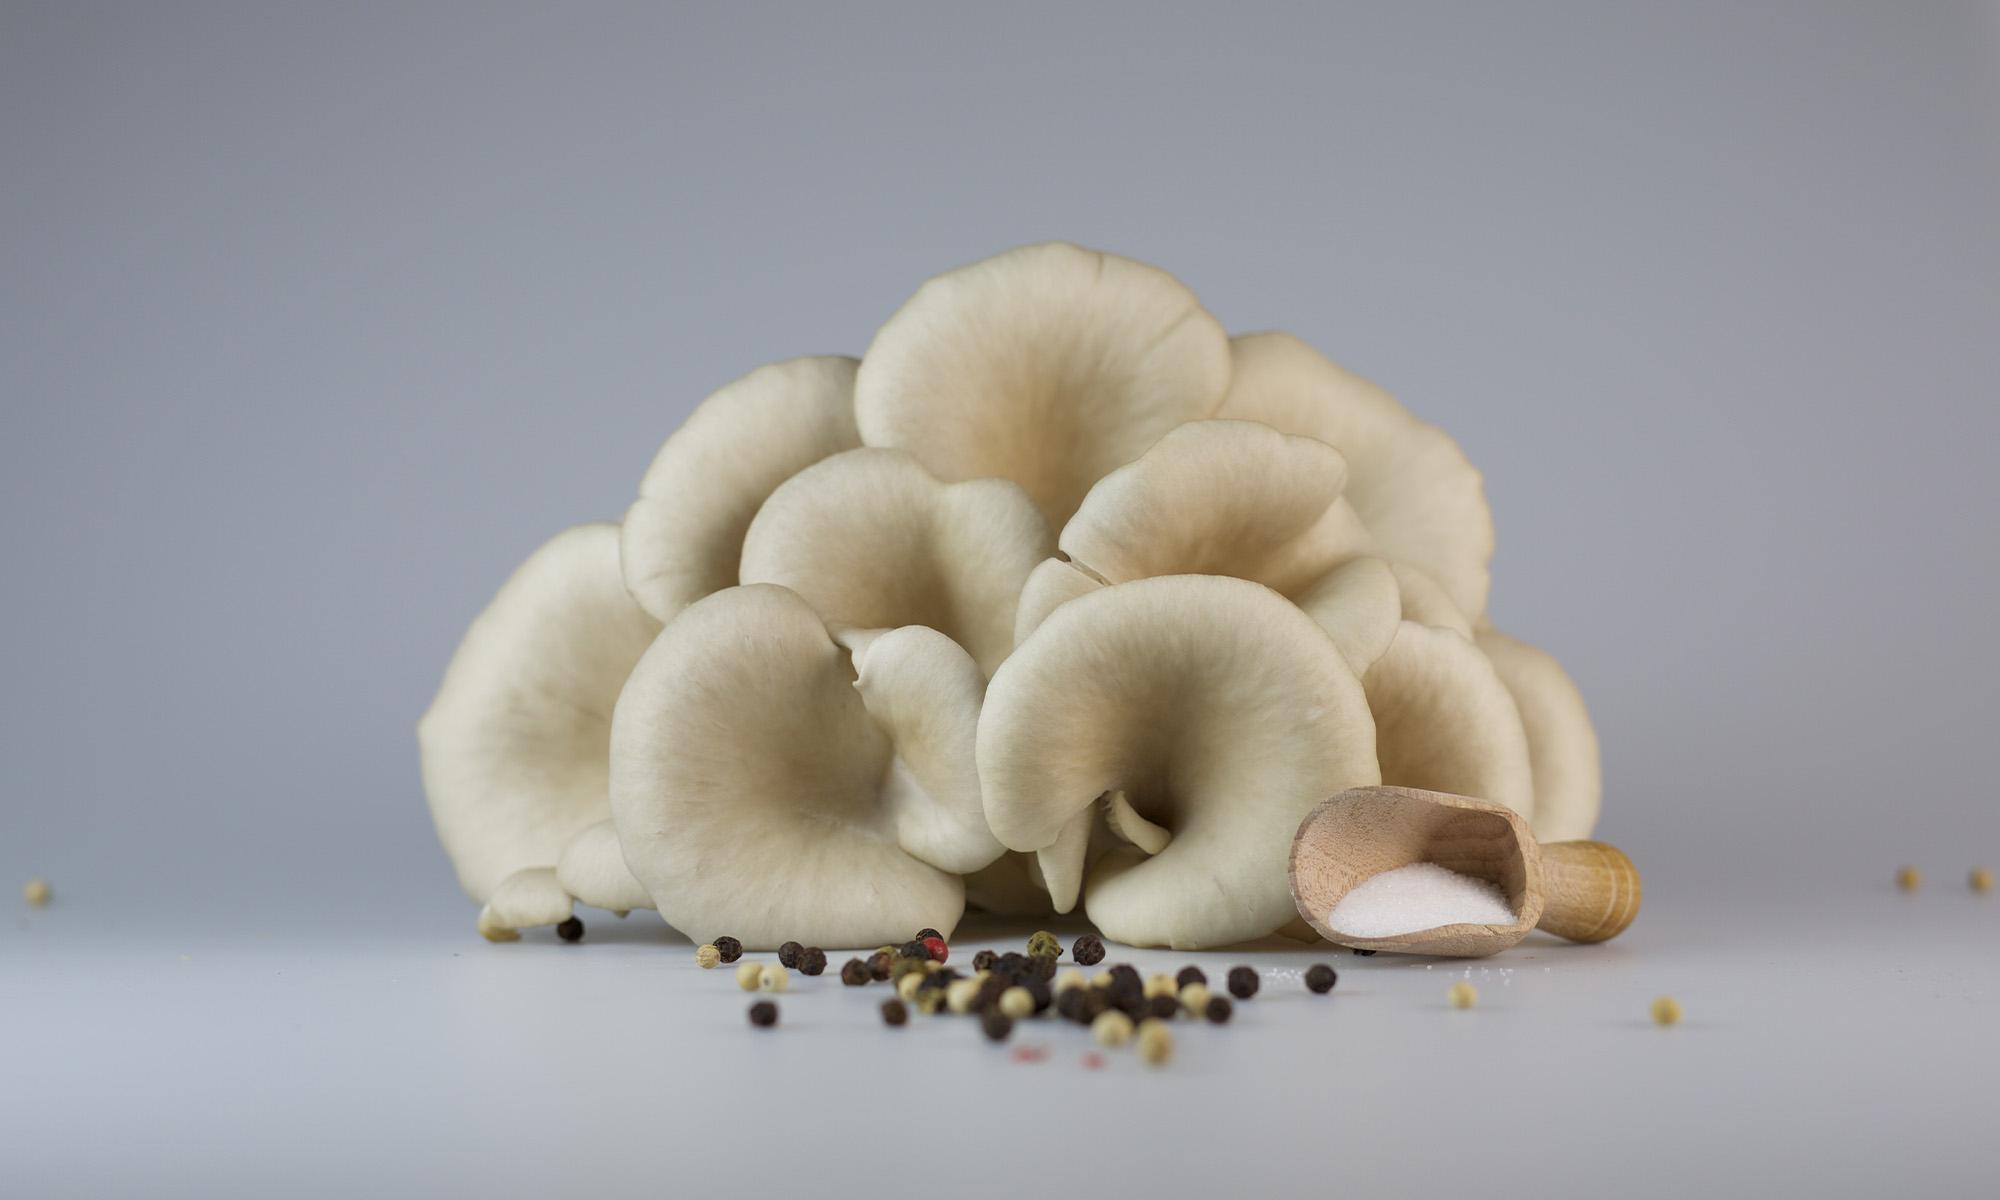 oyster mushrooms, grey background